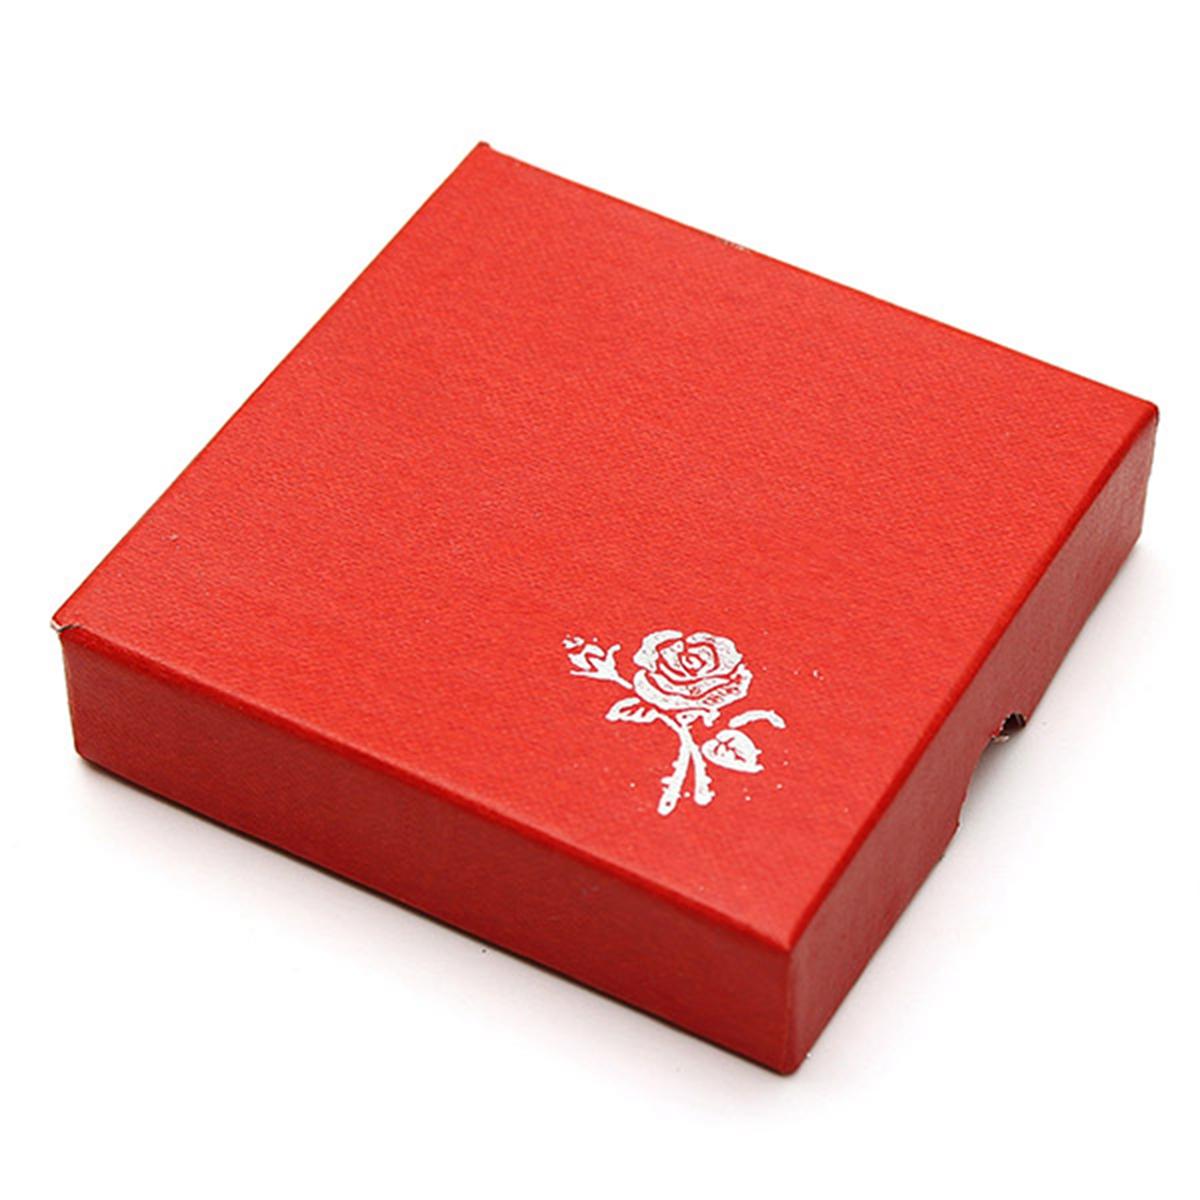 jewelry necklace bracelet bangle watch gift paper. Black Bedroom Furniture Sets. Home Design Ideas